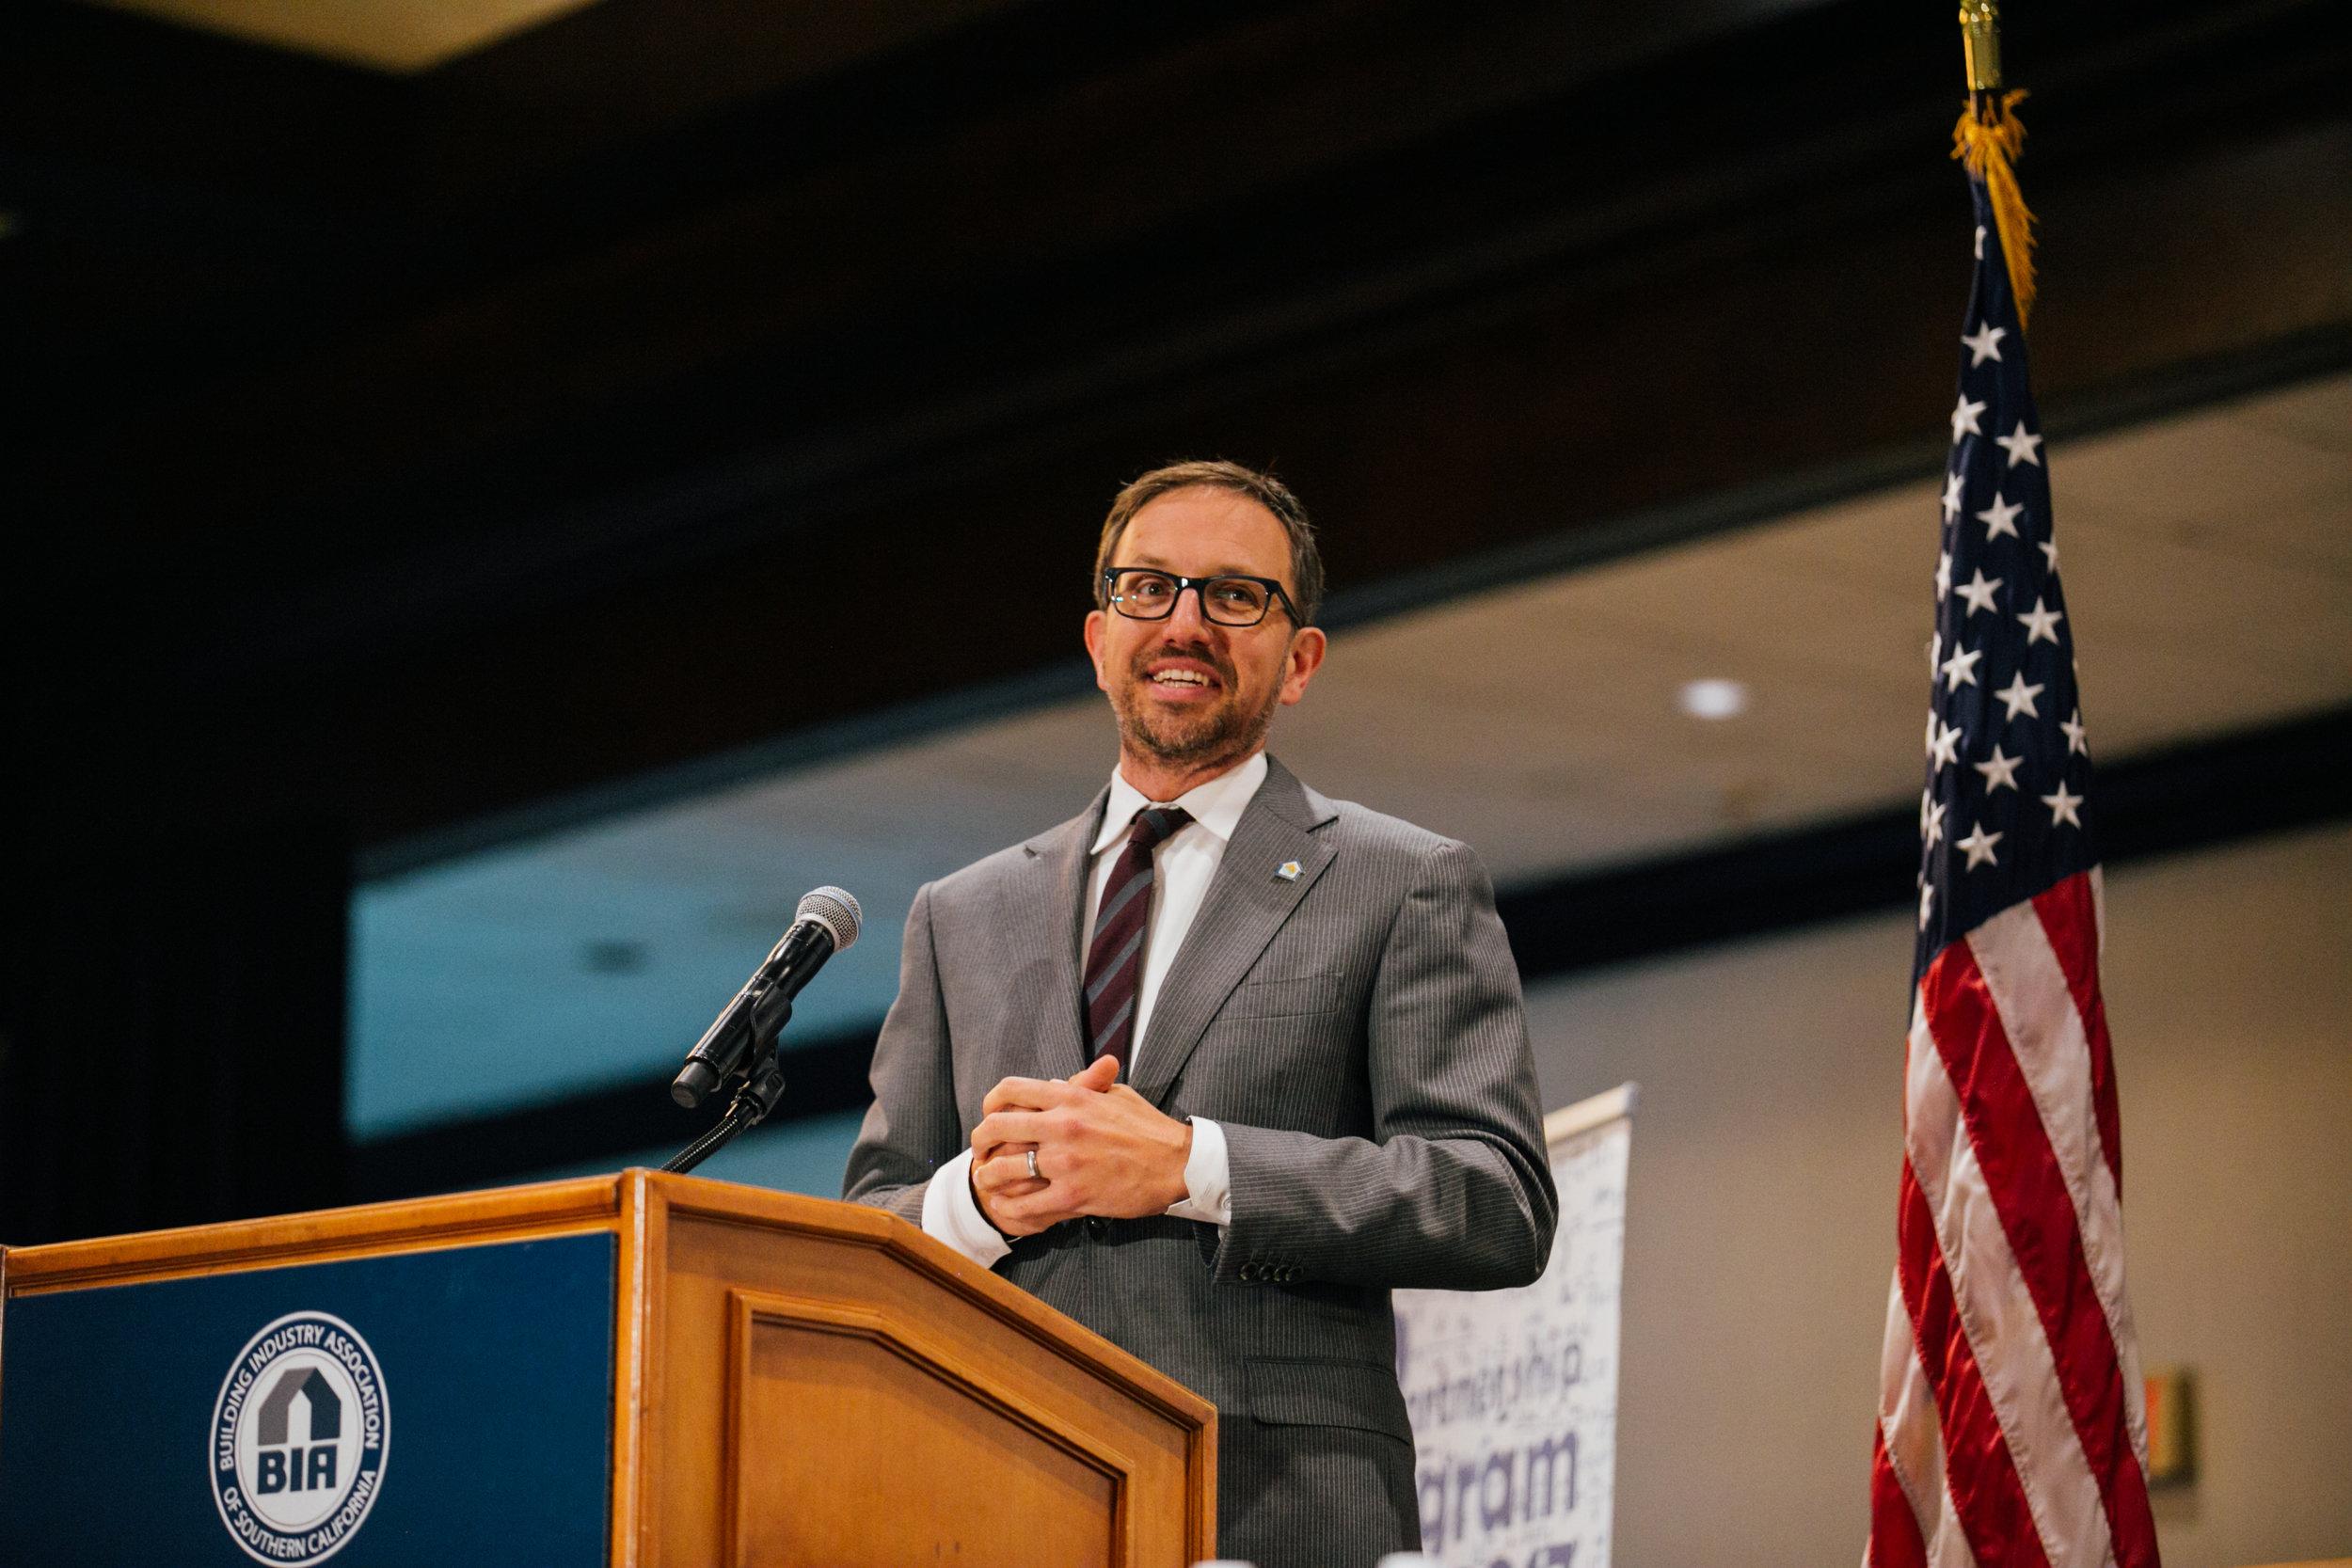 Ben Metcalf, HCD Director